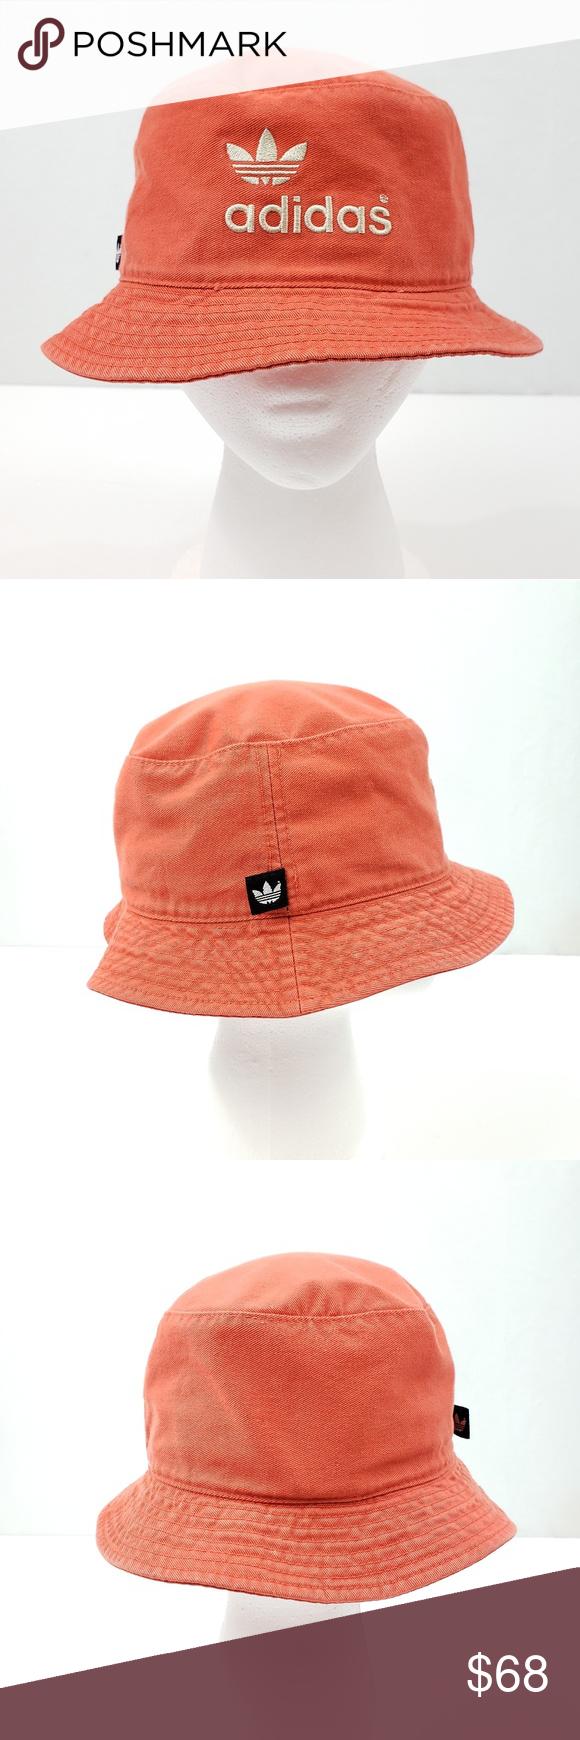 4e0443aa89c3d Vintage 90s Adidas Trefoil Orange Bucket Hat 100% cotton Ivory ...